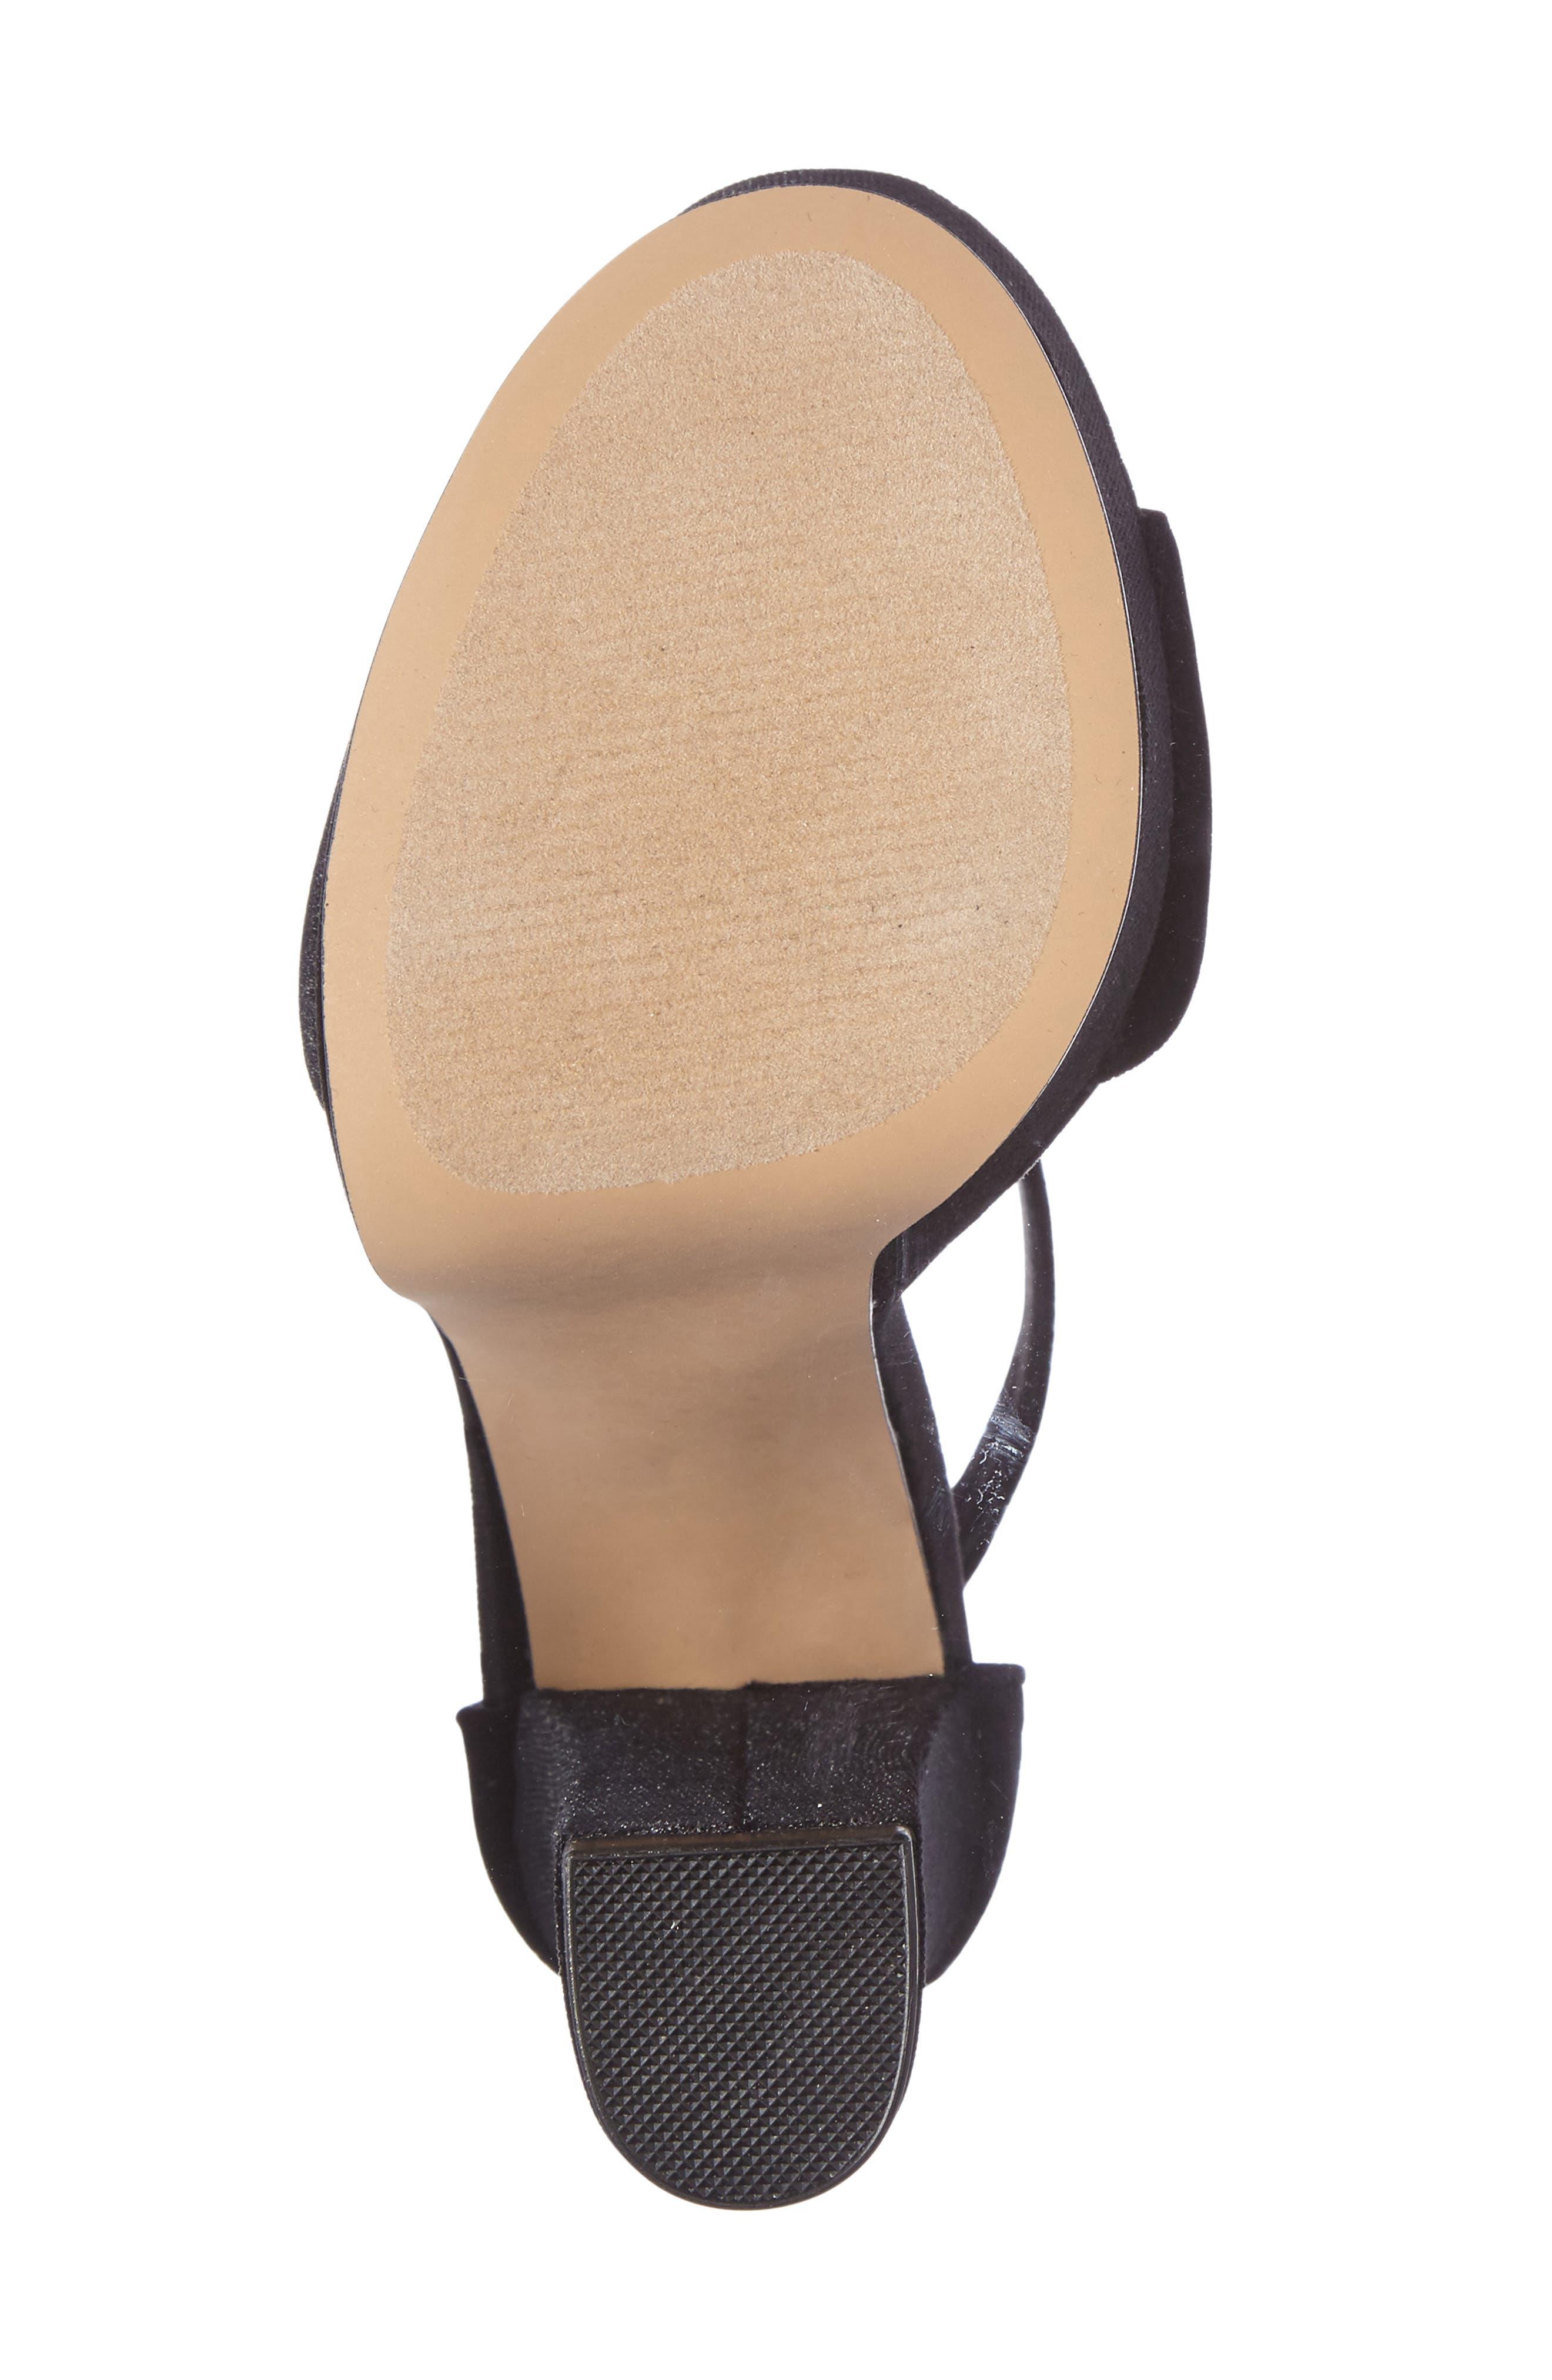 Gonzo Platform Sandal,                             Alternate thumbnail 4, color,                             001